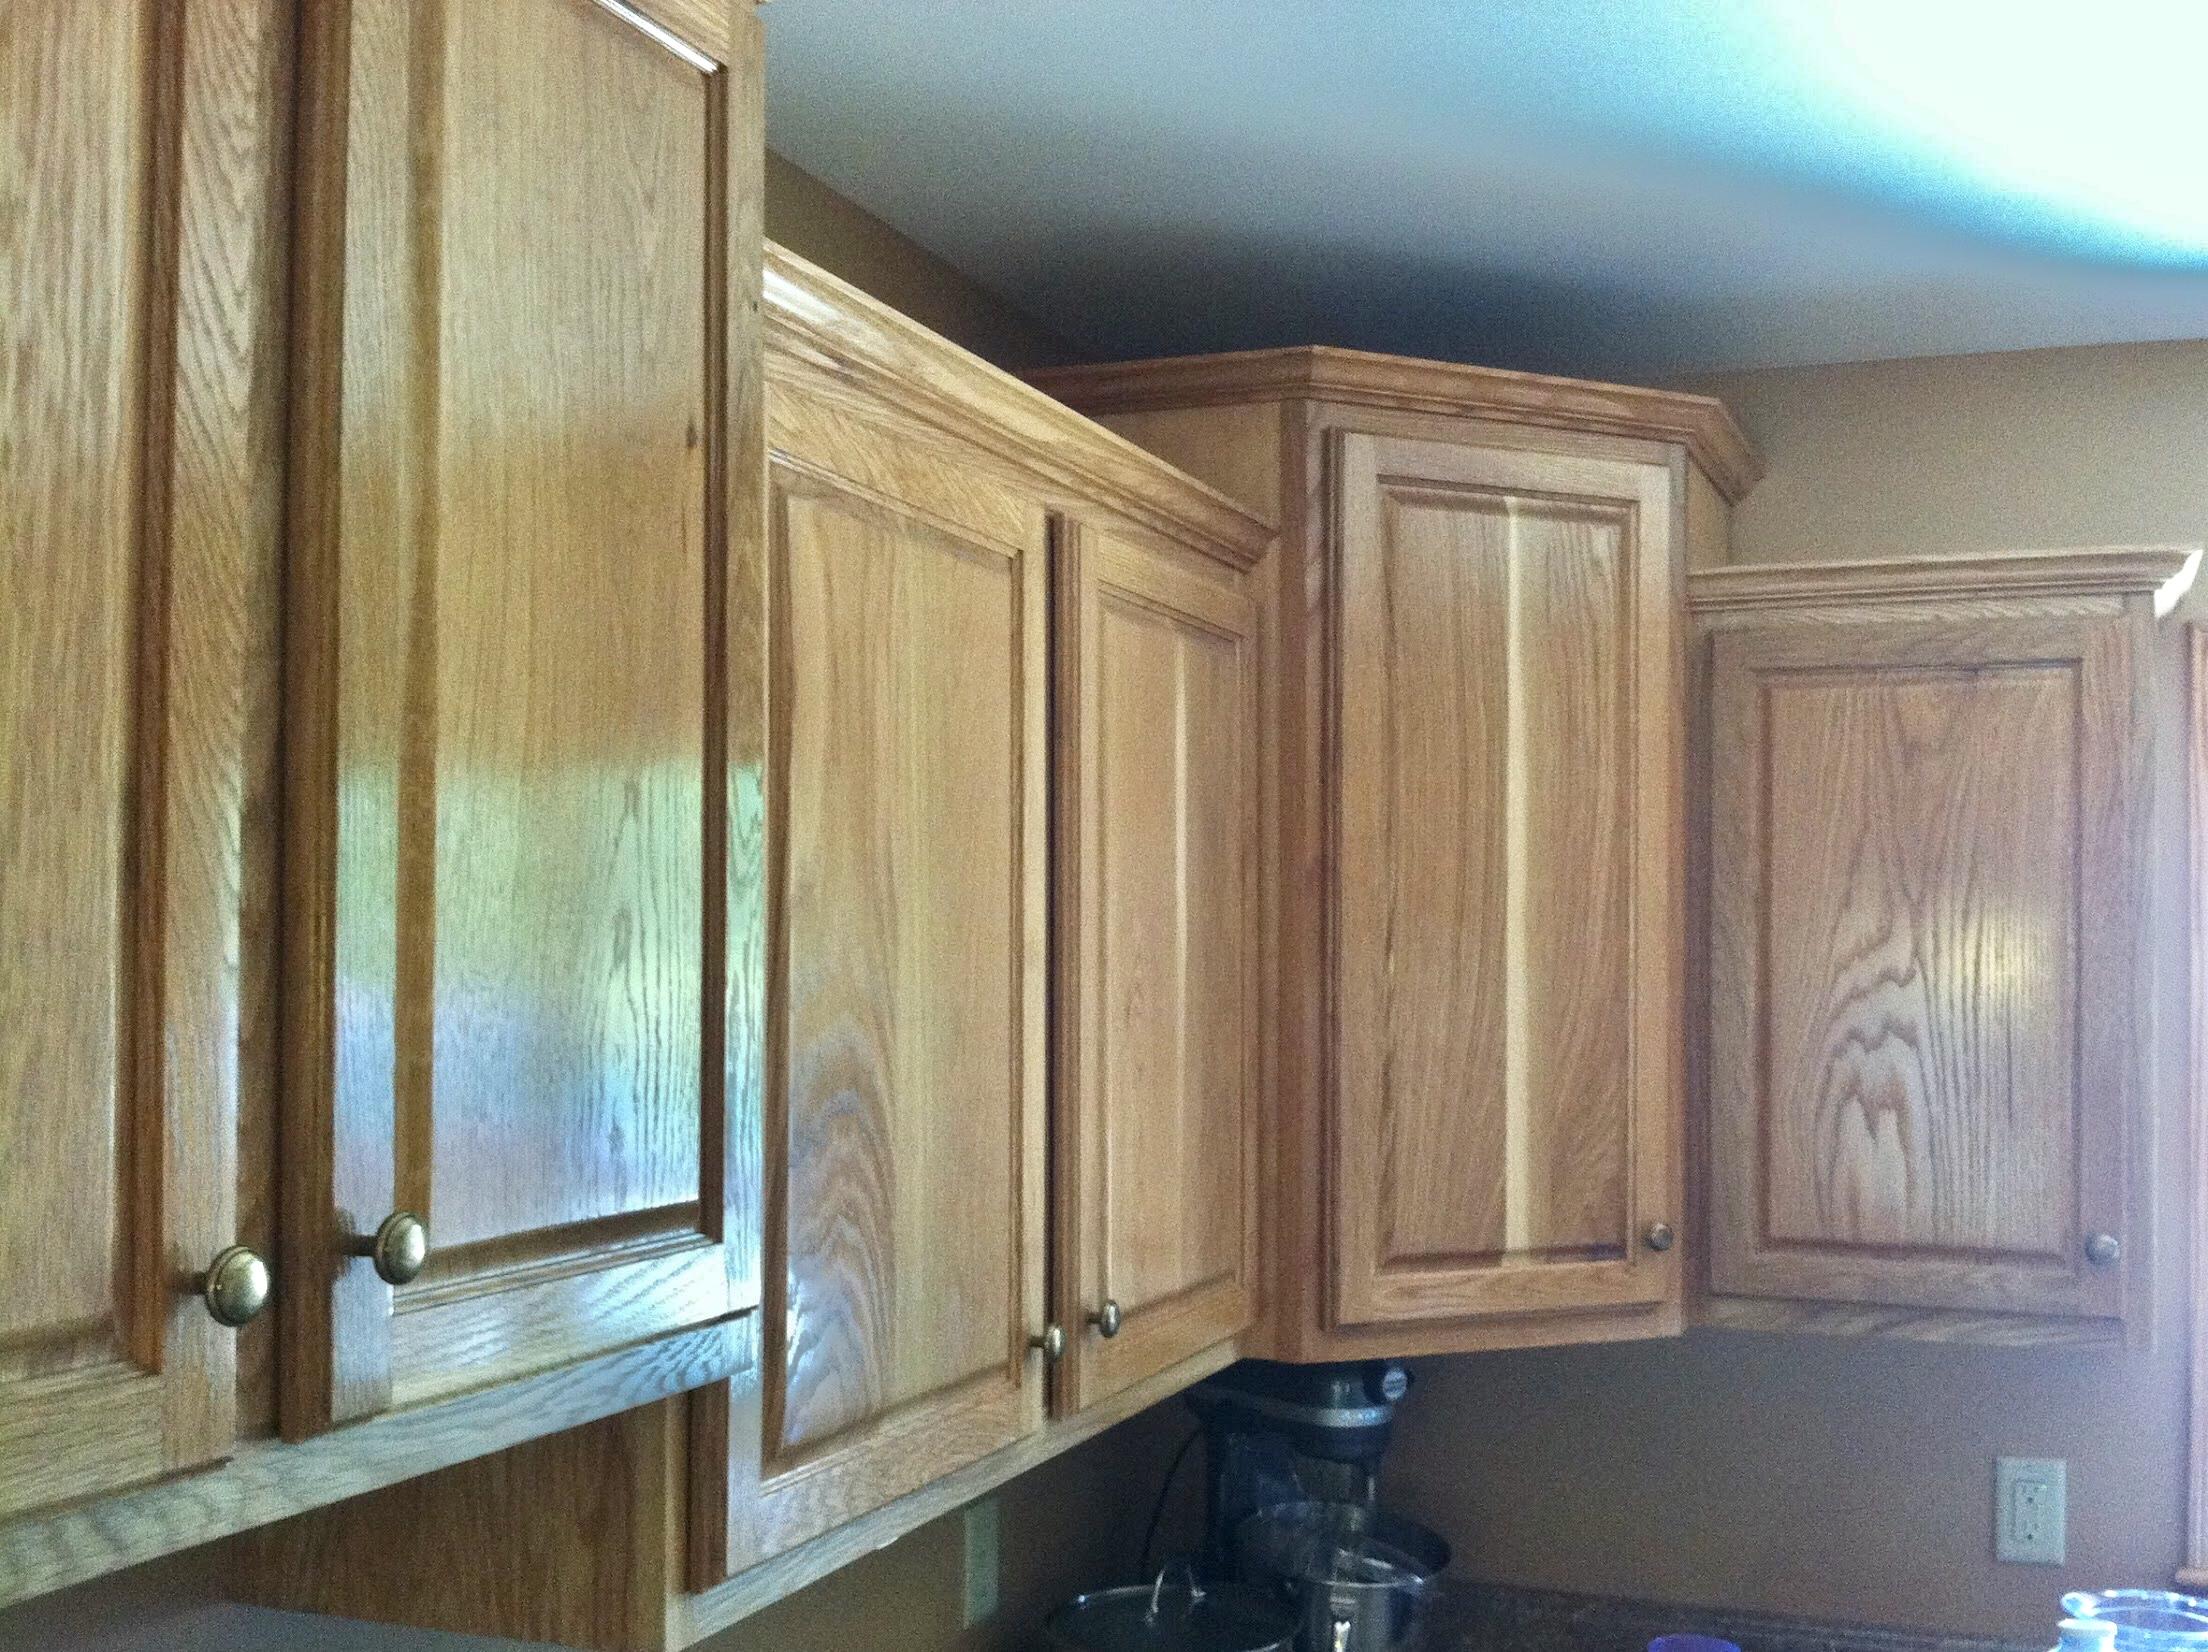 Kitchen Cabinets in White Oak